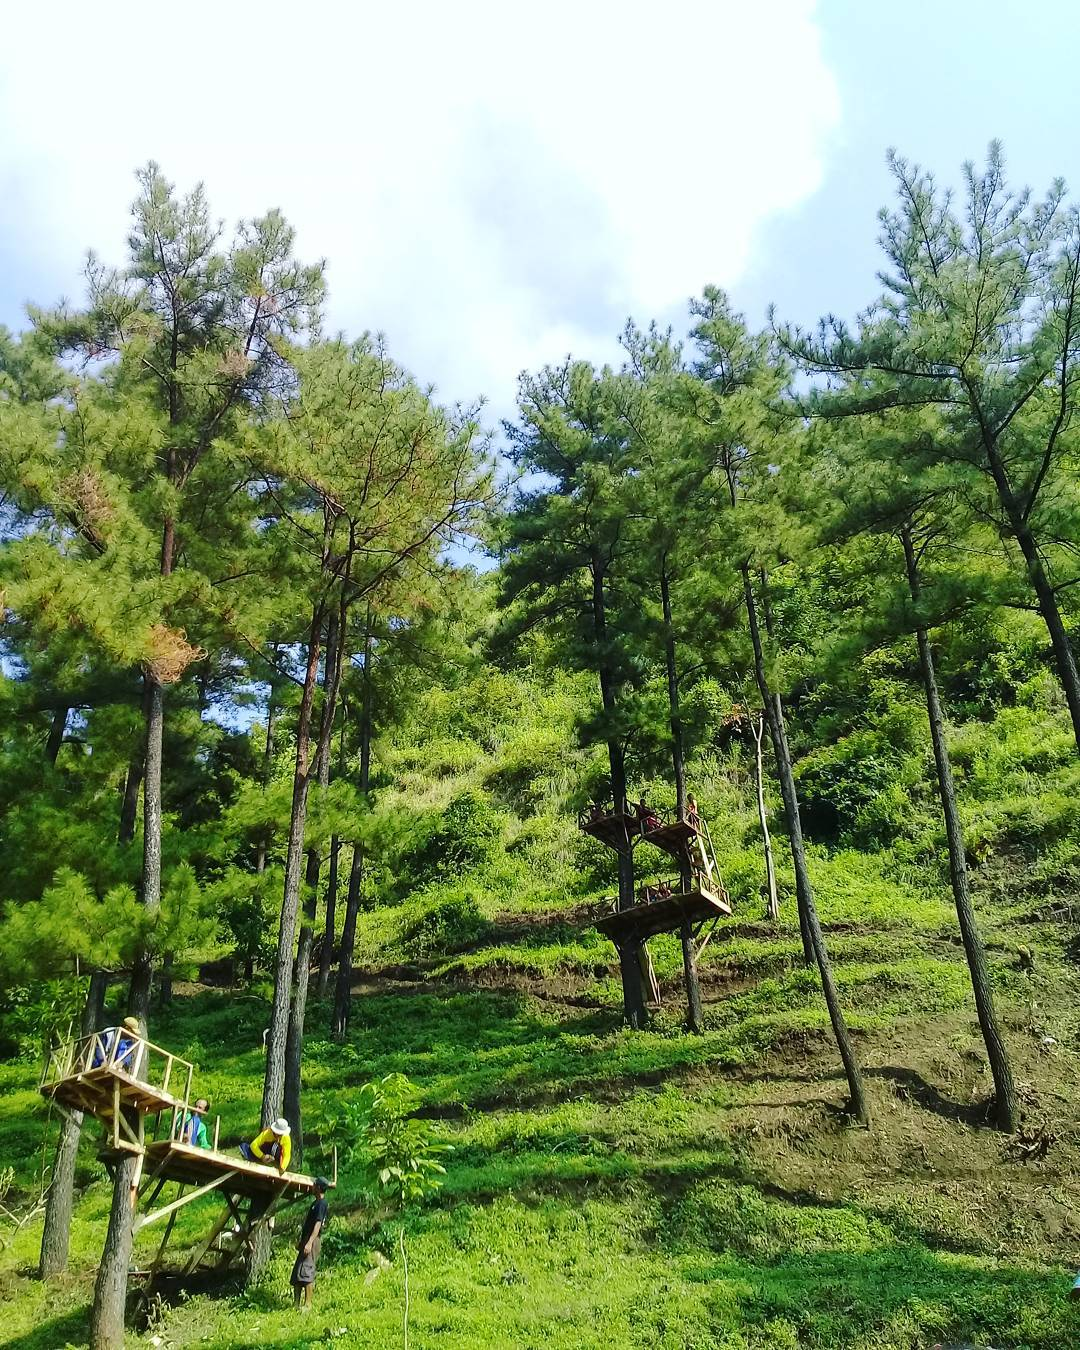 Hits Taman Kelinci Pembangunan Wisata Peningkatan Kualitas Hidup Air Kintamani